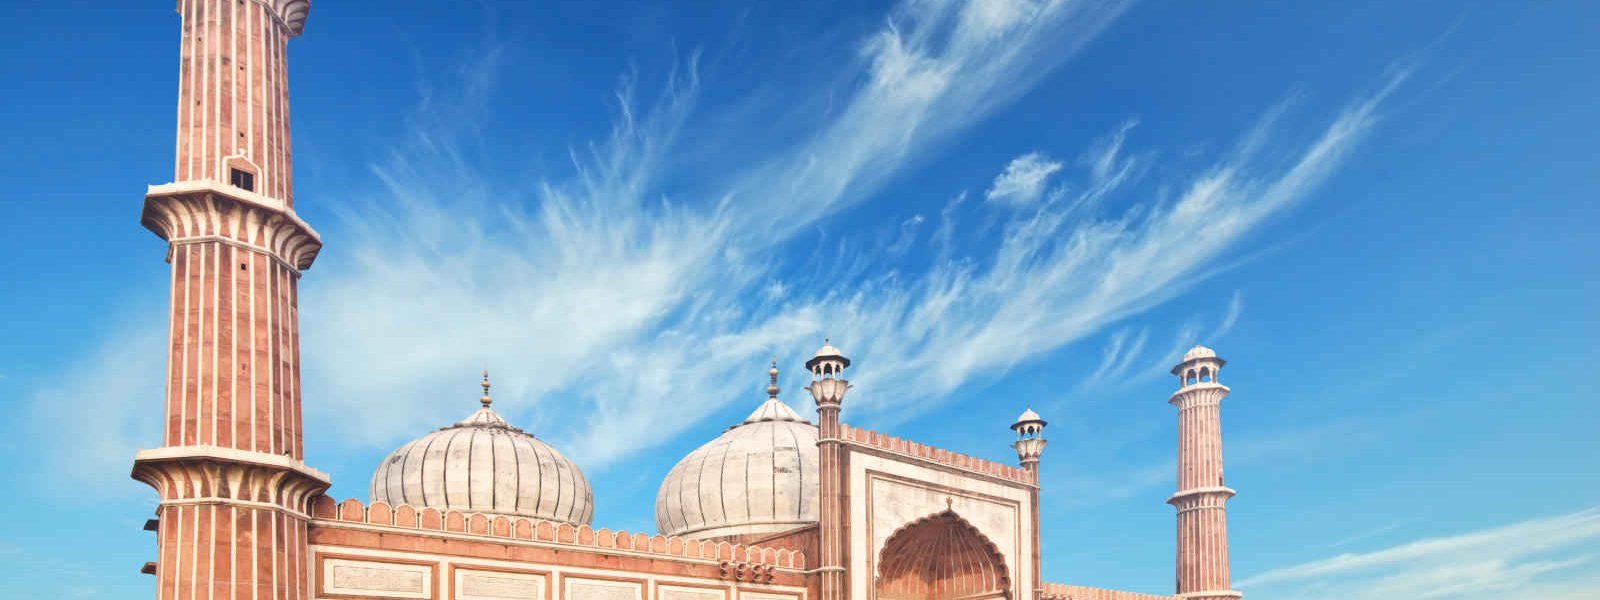 Mosquée Jama Masjid, Delhi, Rajasthan, Inde